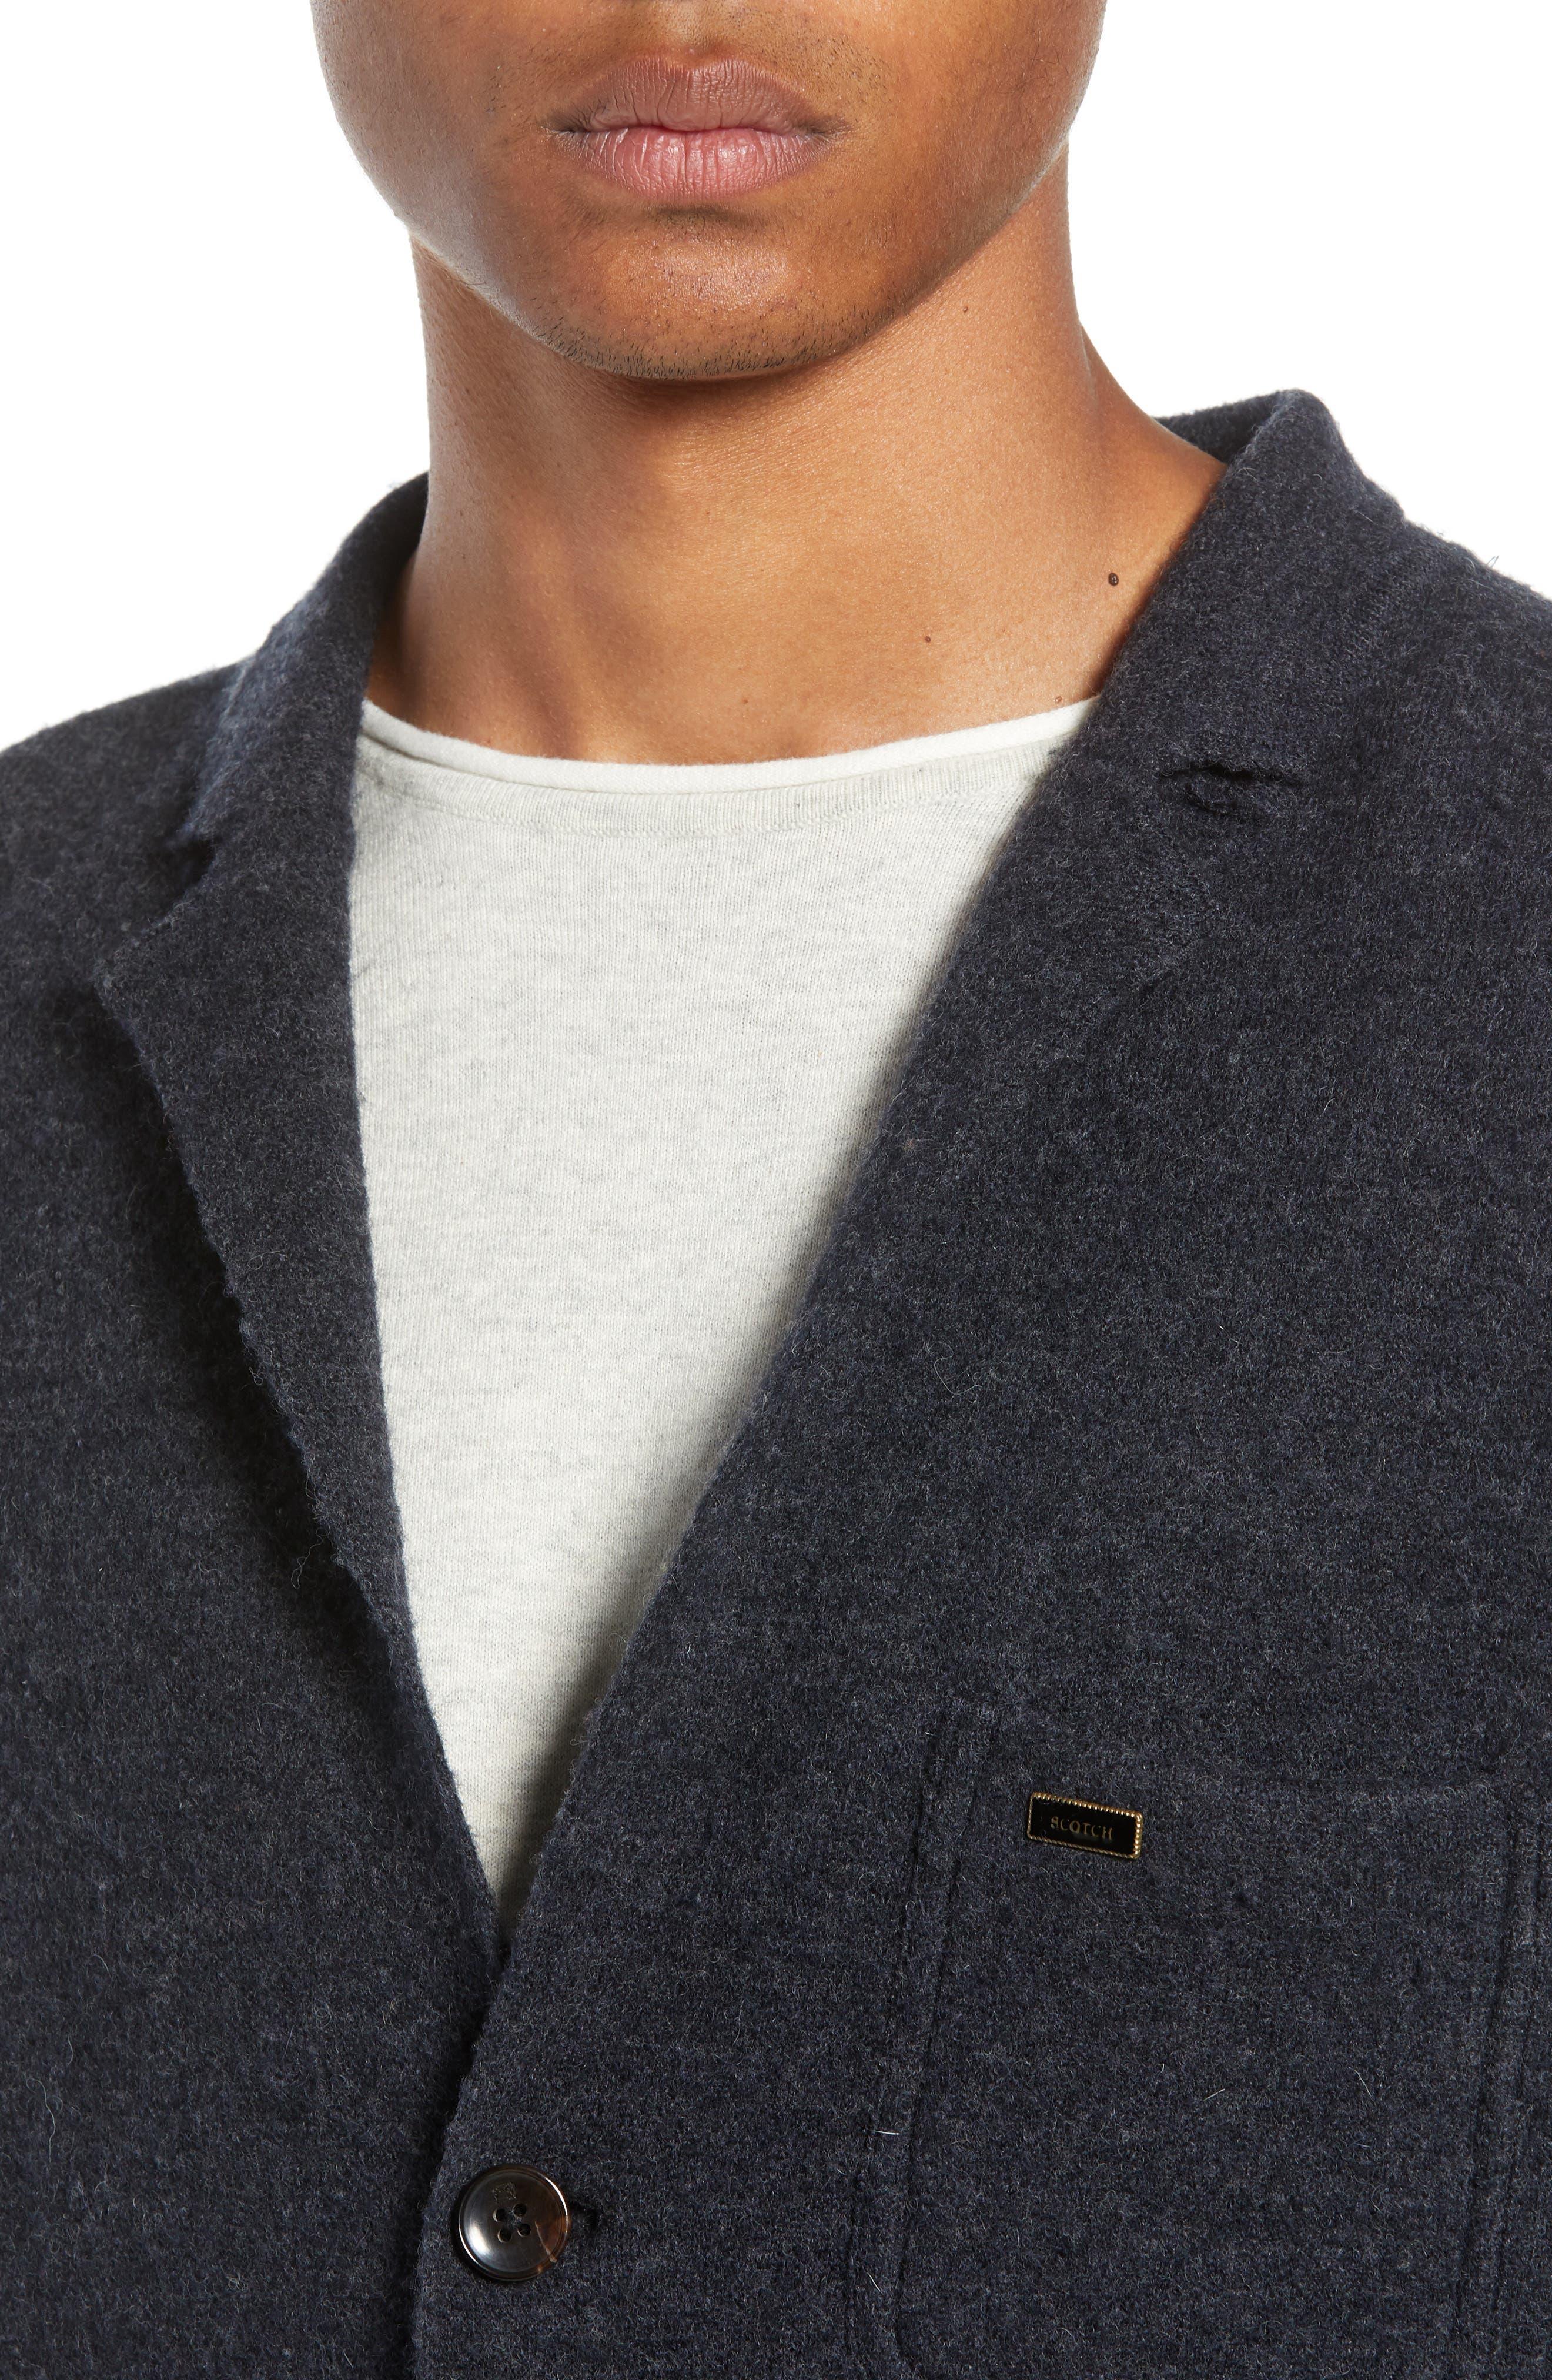 Boiled Wool Blazer,                             Alternate thumbnail 4, color,                             CHARCOAL MELANGE